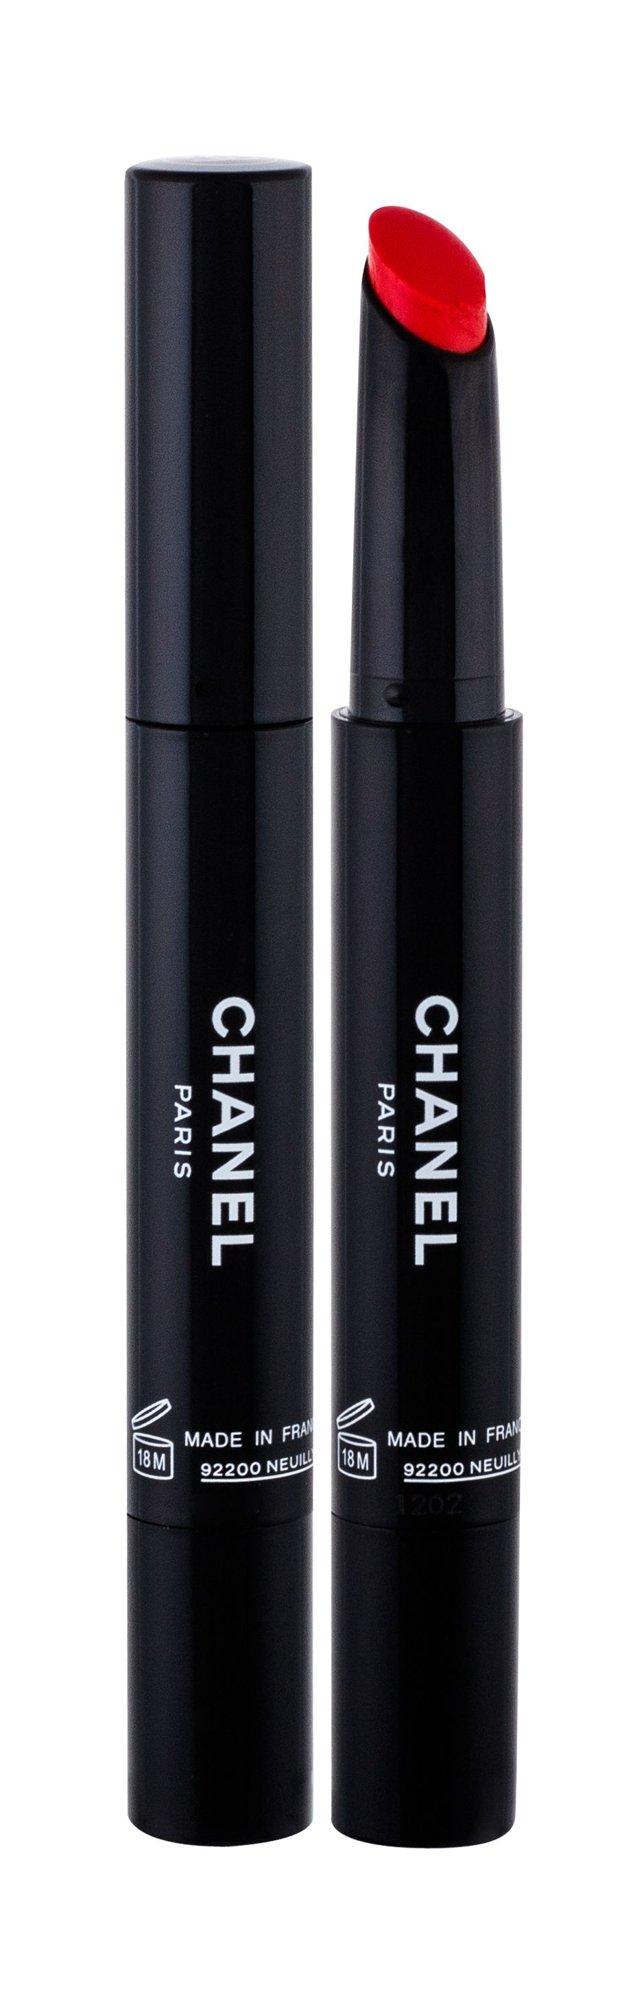 Chanel Rouge Coco Lipstick 2ml 222 Fiction Stylo